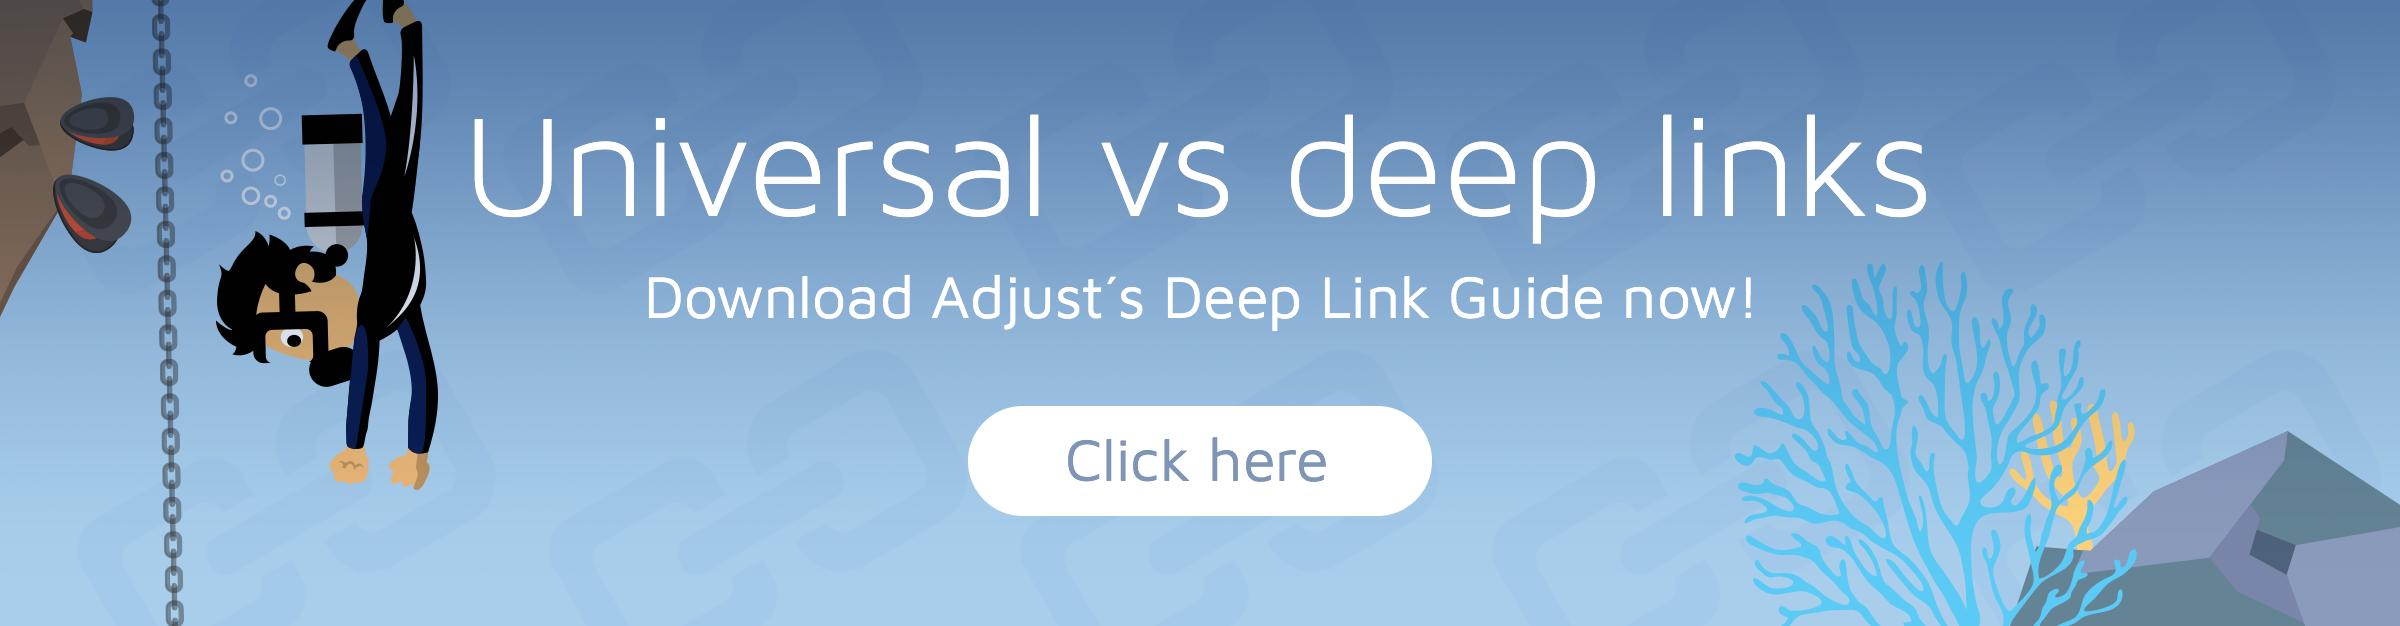 Universal Links vs  Deep Links: Key differences | Adjust